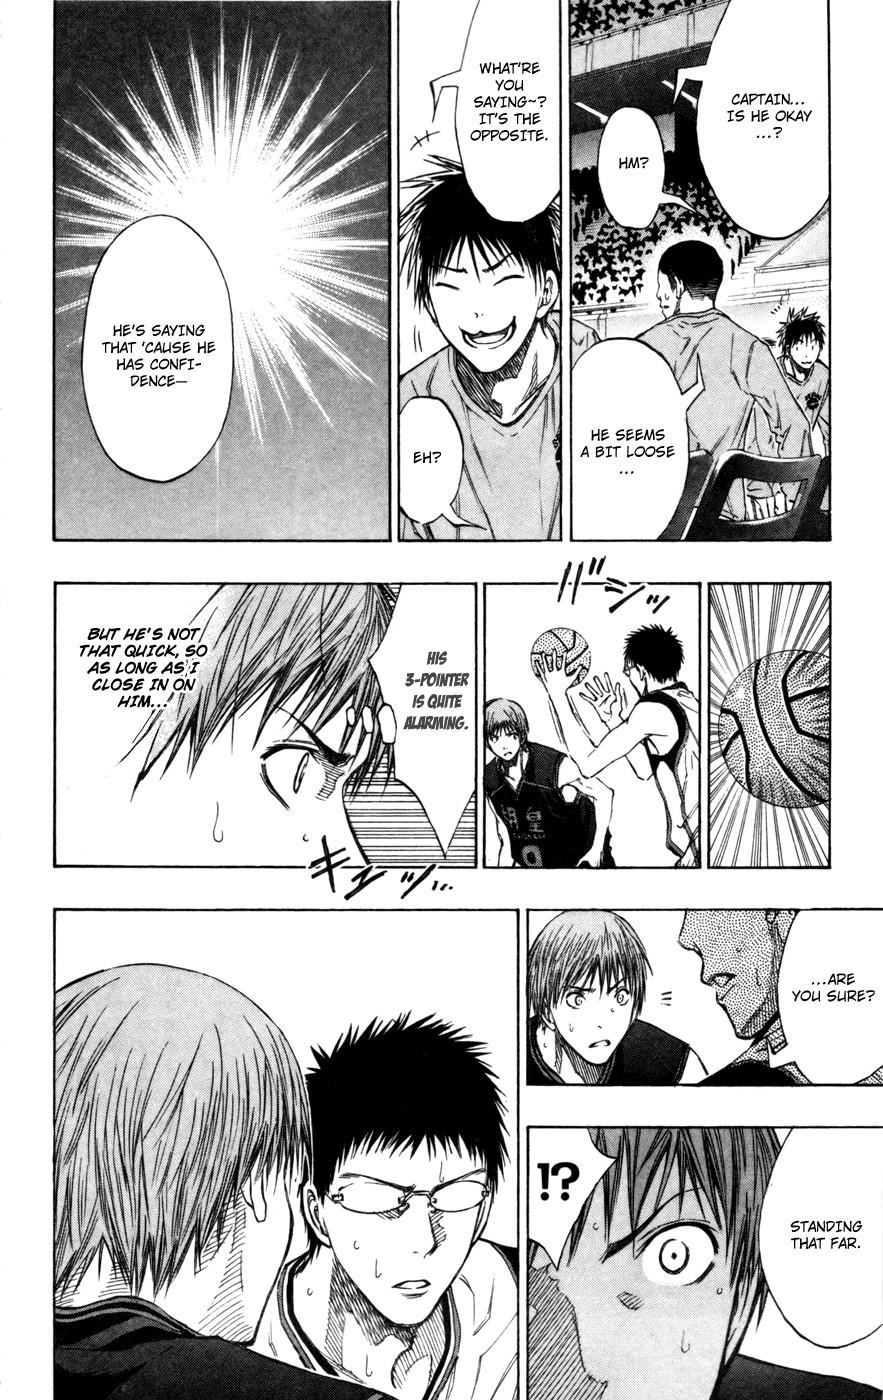 Kuroko no Basket Manga Chapter 117 - Image 3_182